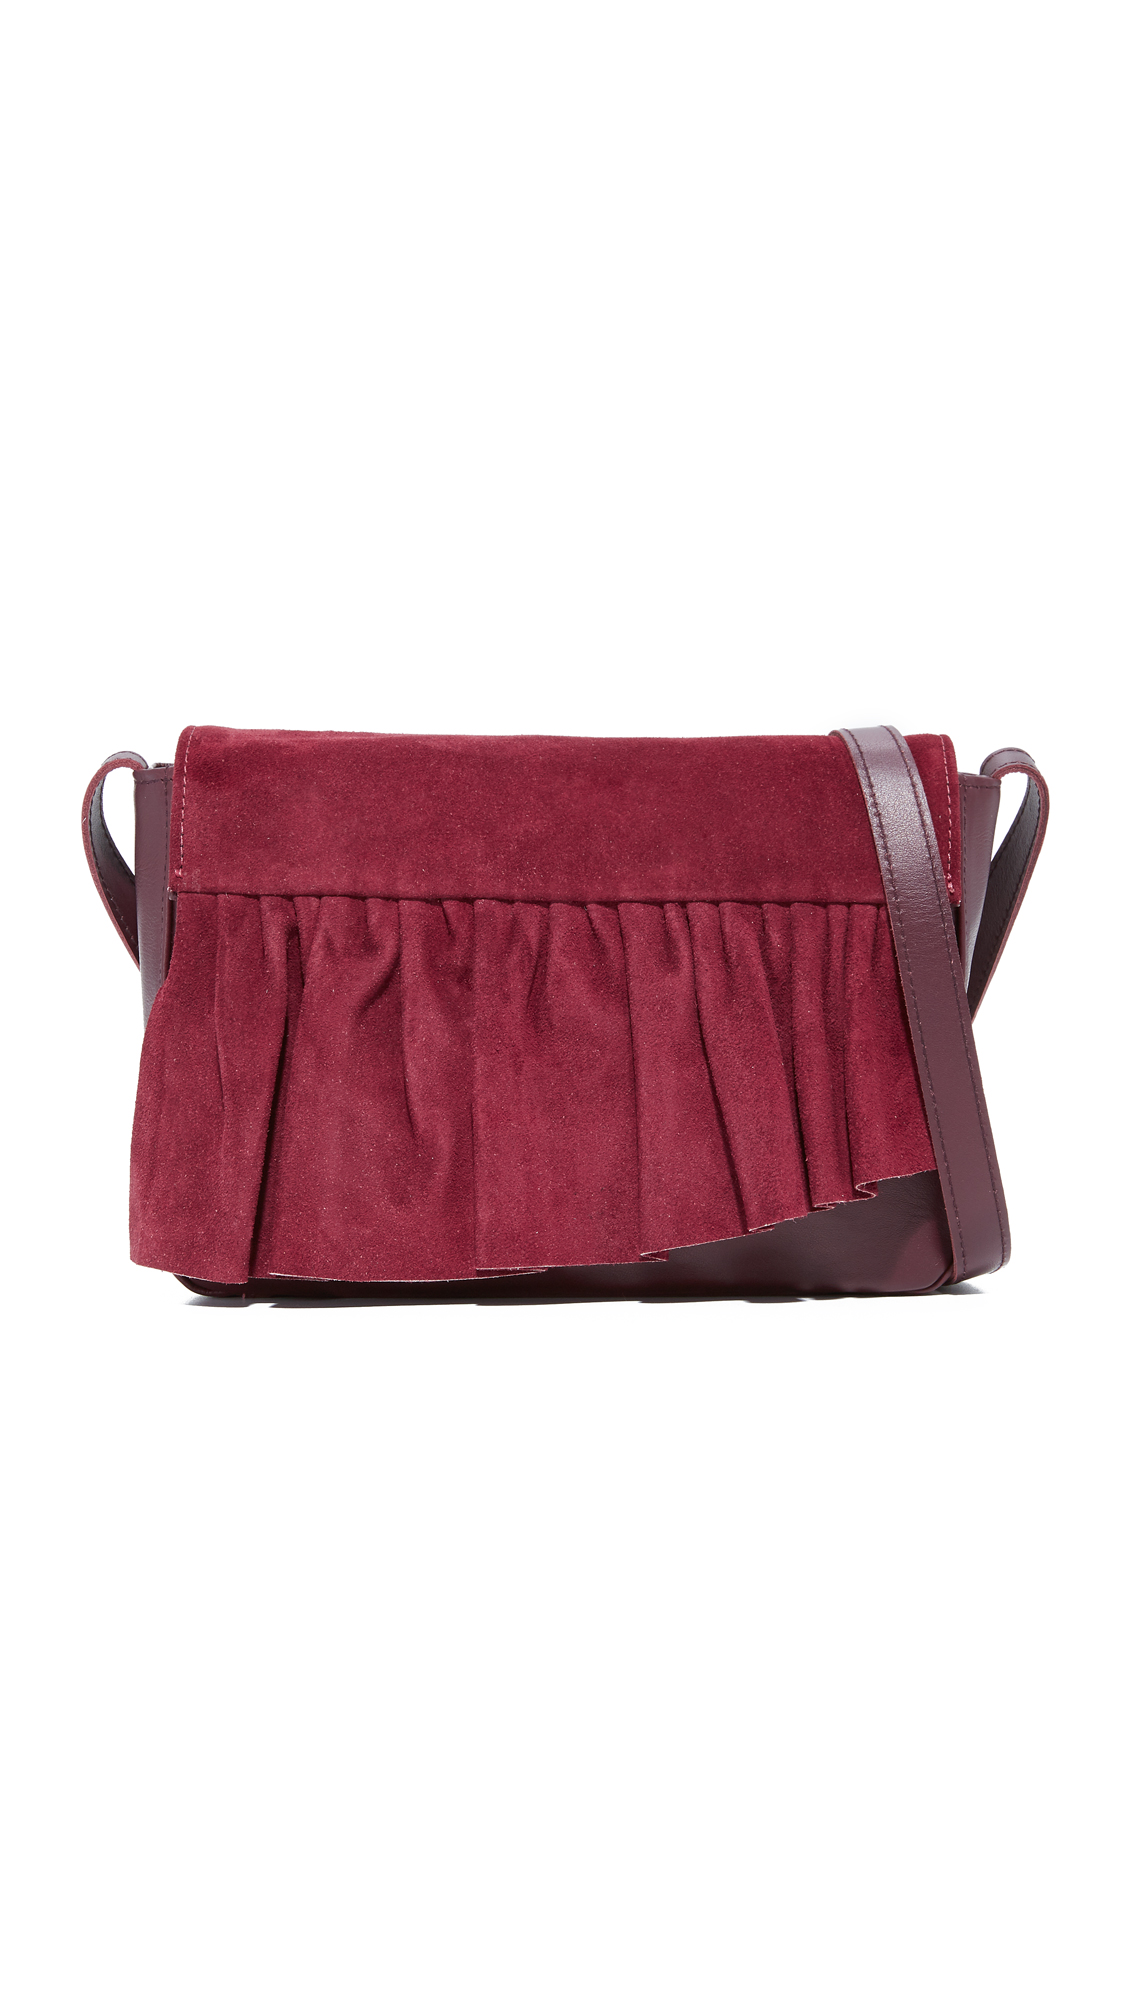 Marie Turnor Accessories Small Ruffle Cross Body Bag - Burgundy